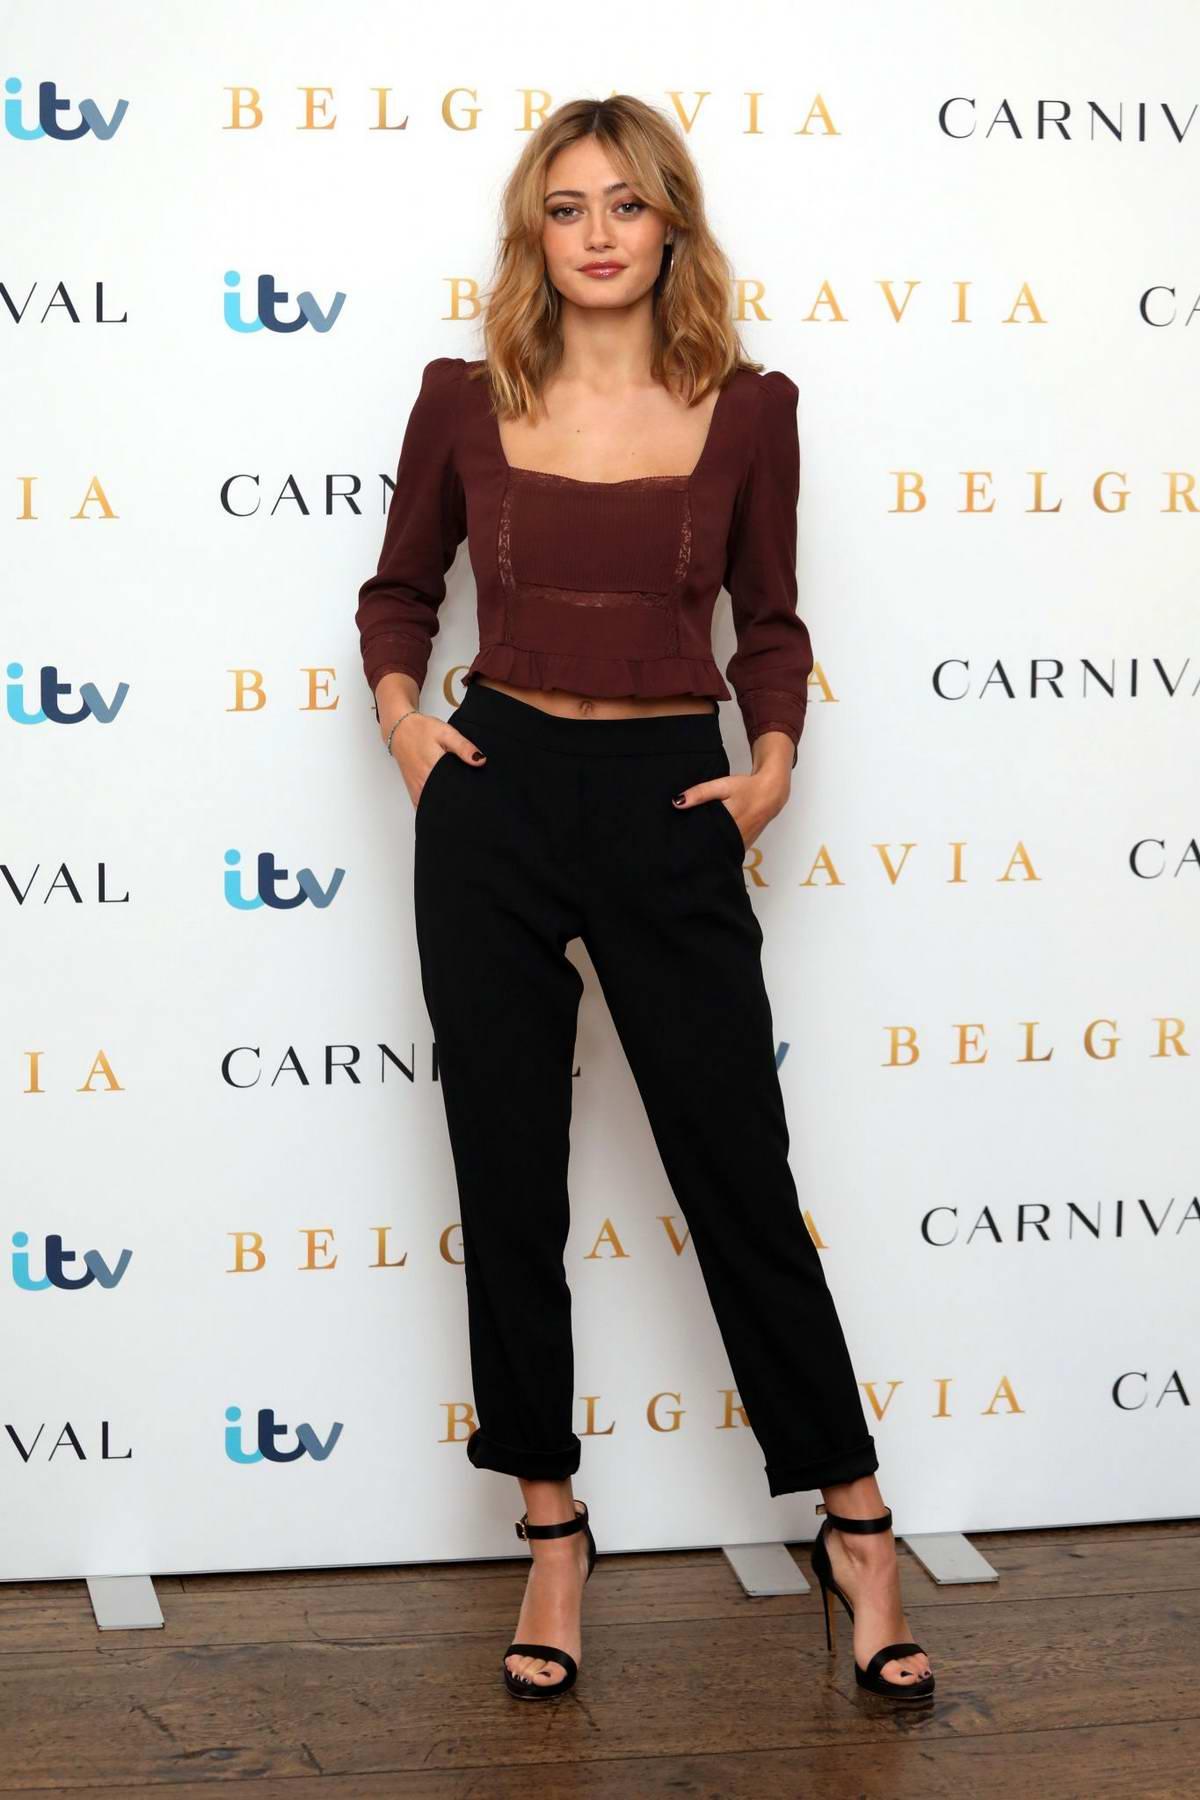 Ella Purnell attends 'Belgravia' Photocall in London, UK